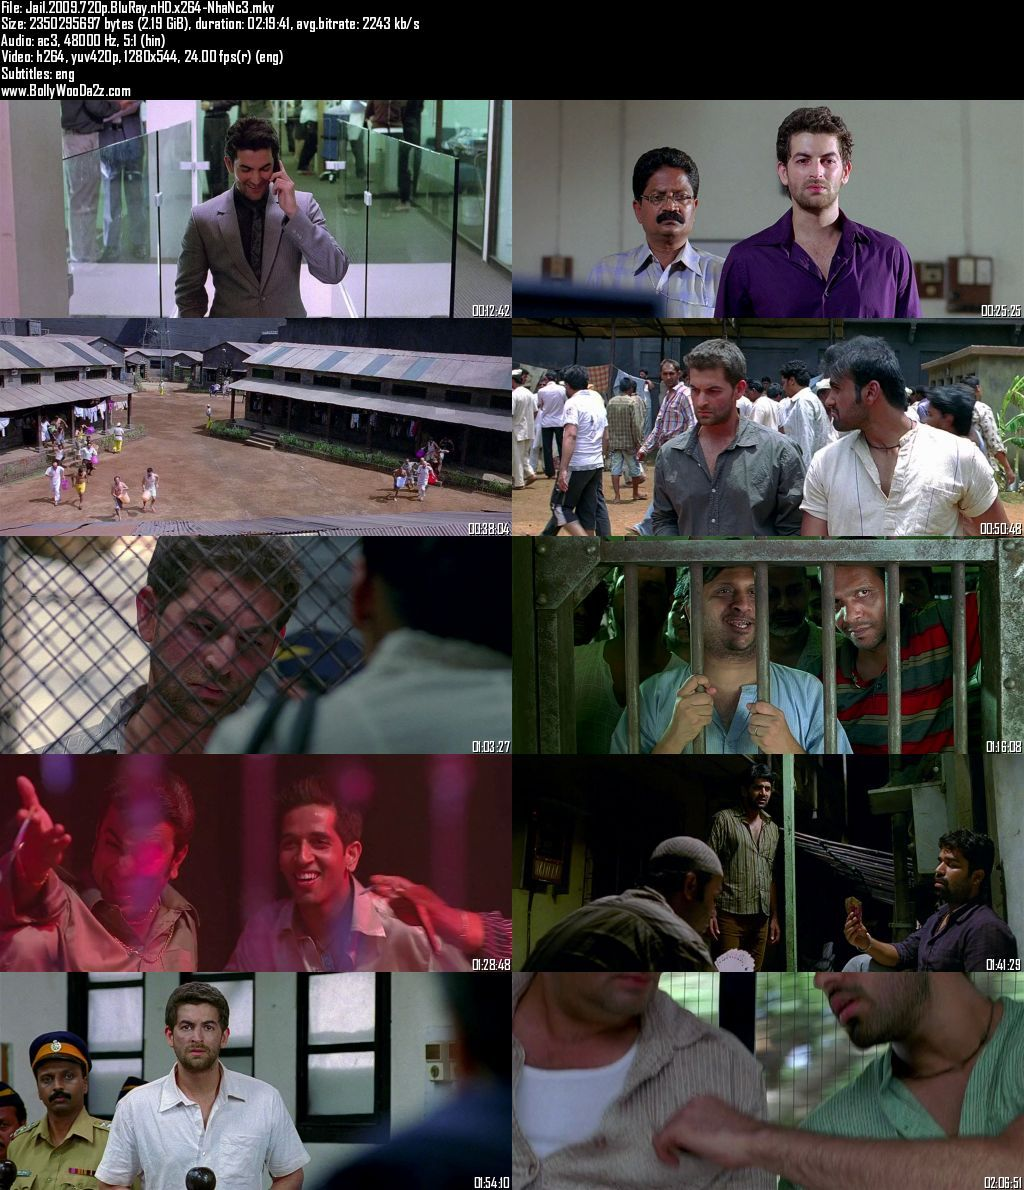 Jail (2009) 720p - BluRay - x264 - DD5.1-NhaNc3